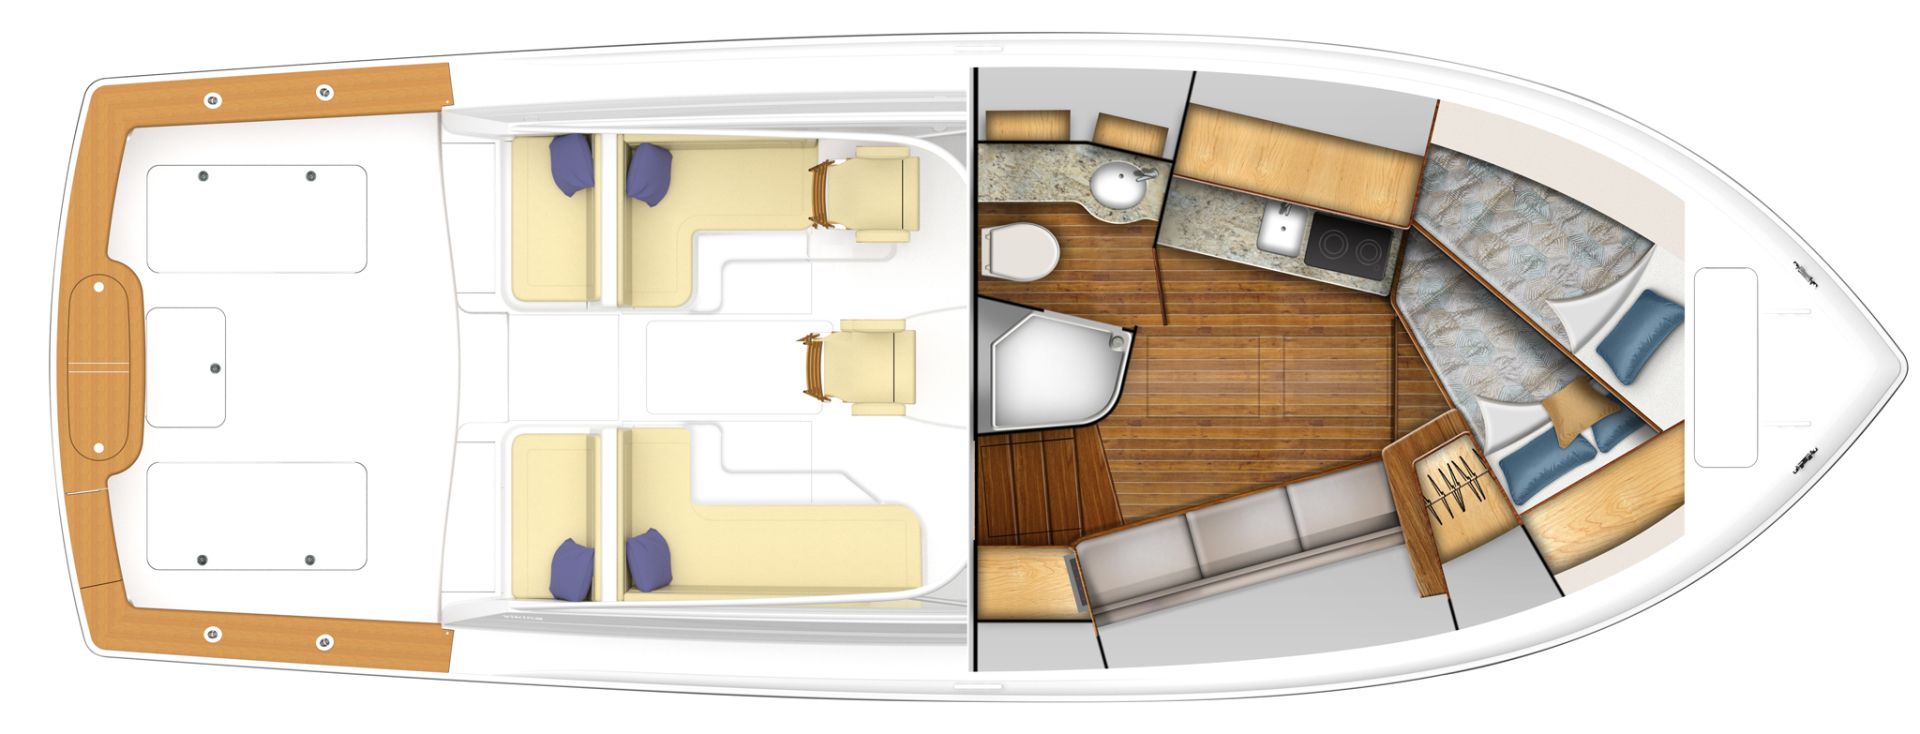 Cabin/Interior Layout